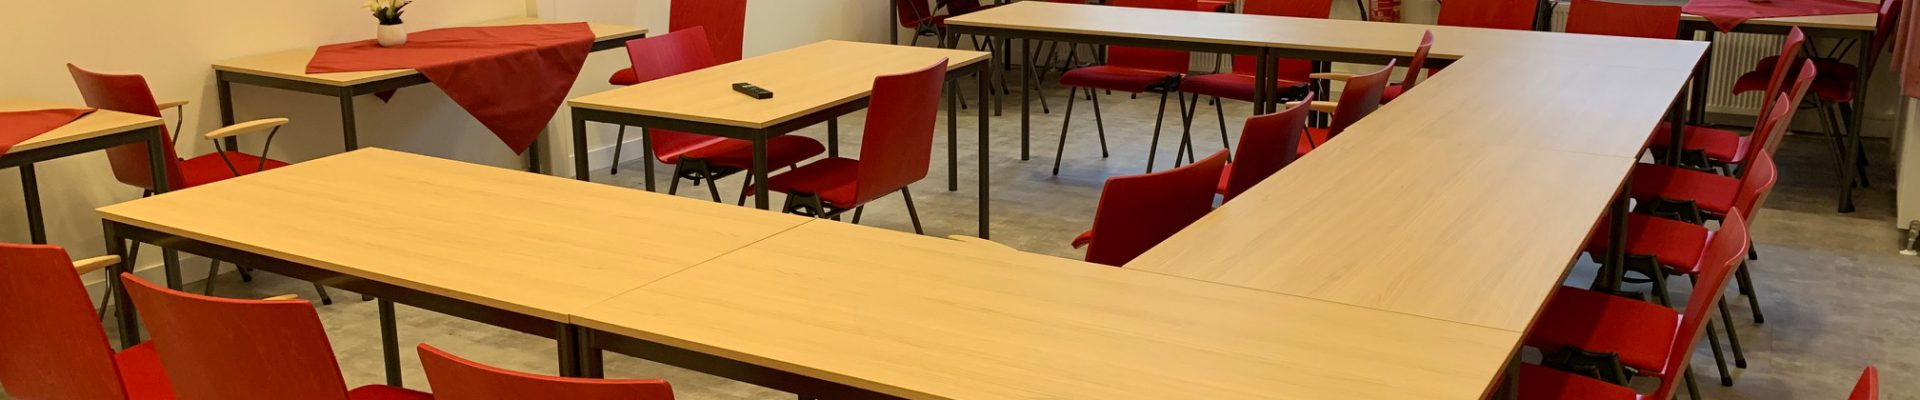 Foto van U-vormige cursusopstelling in zaal 2